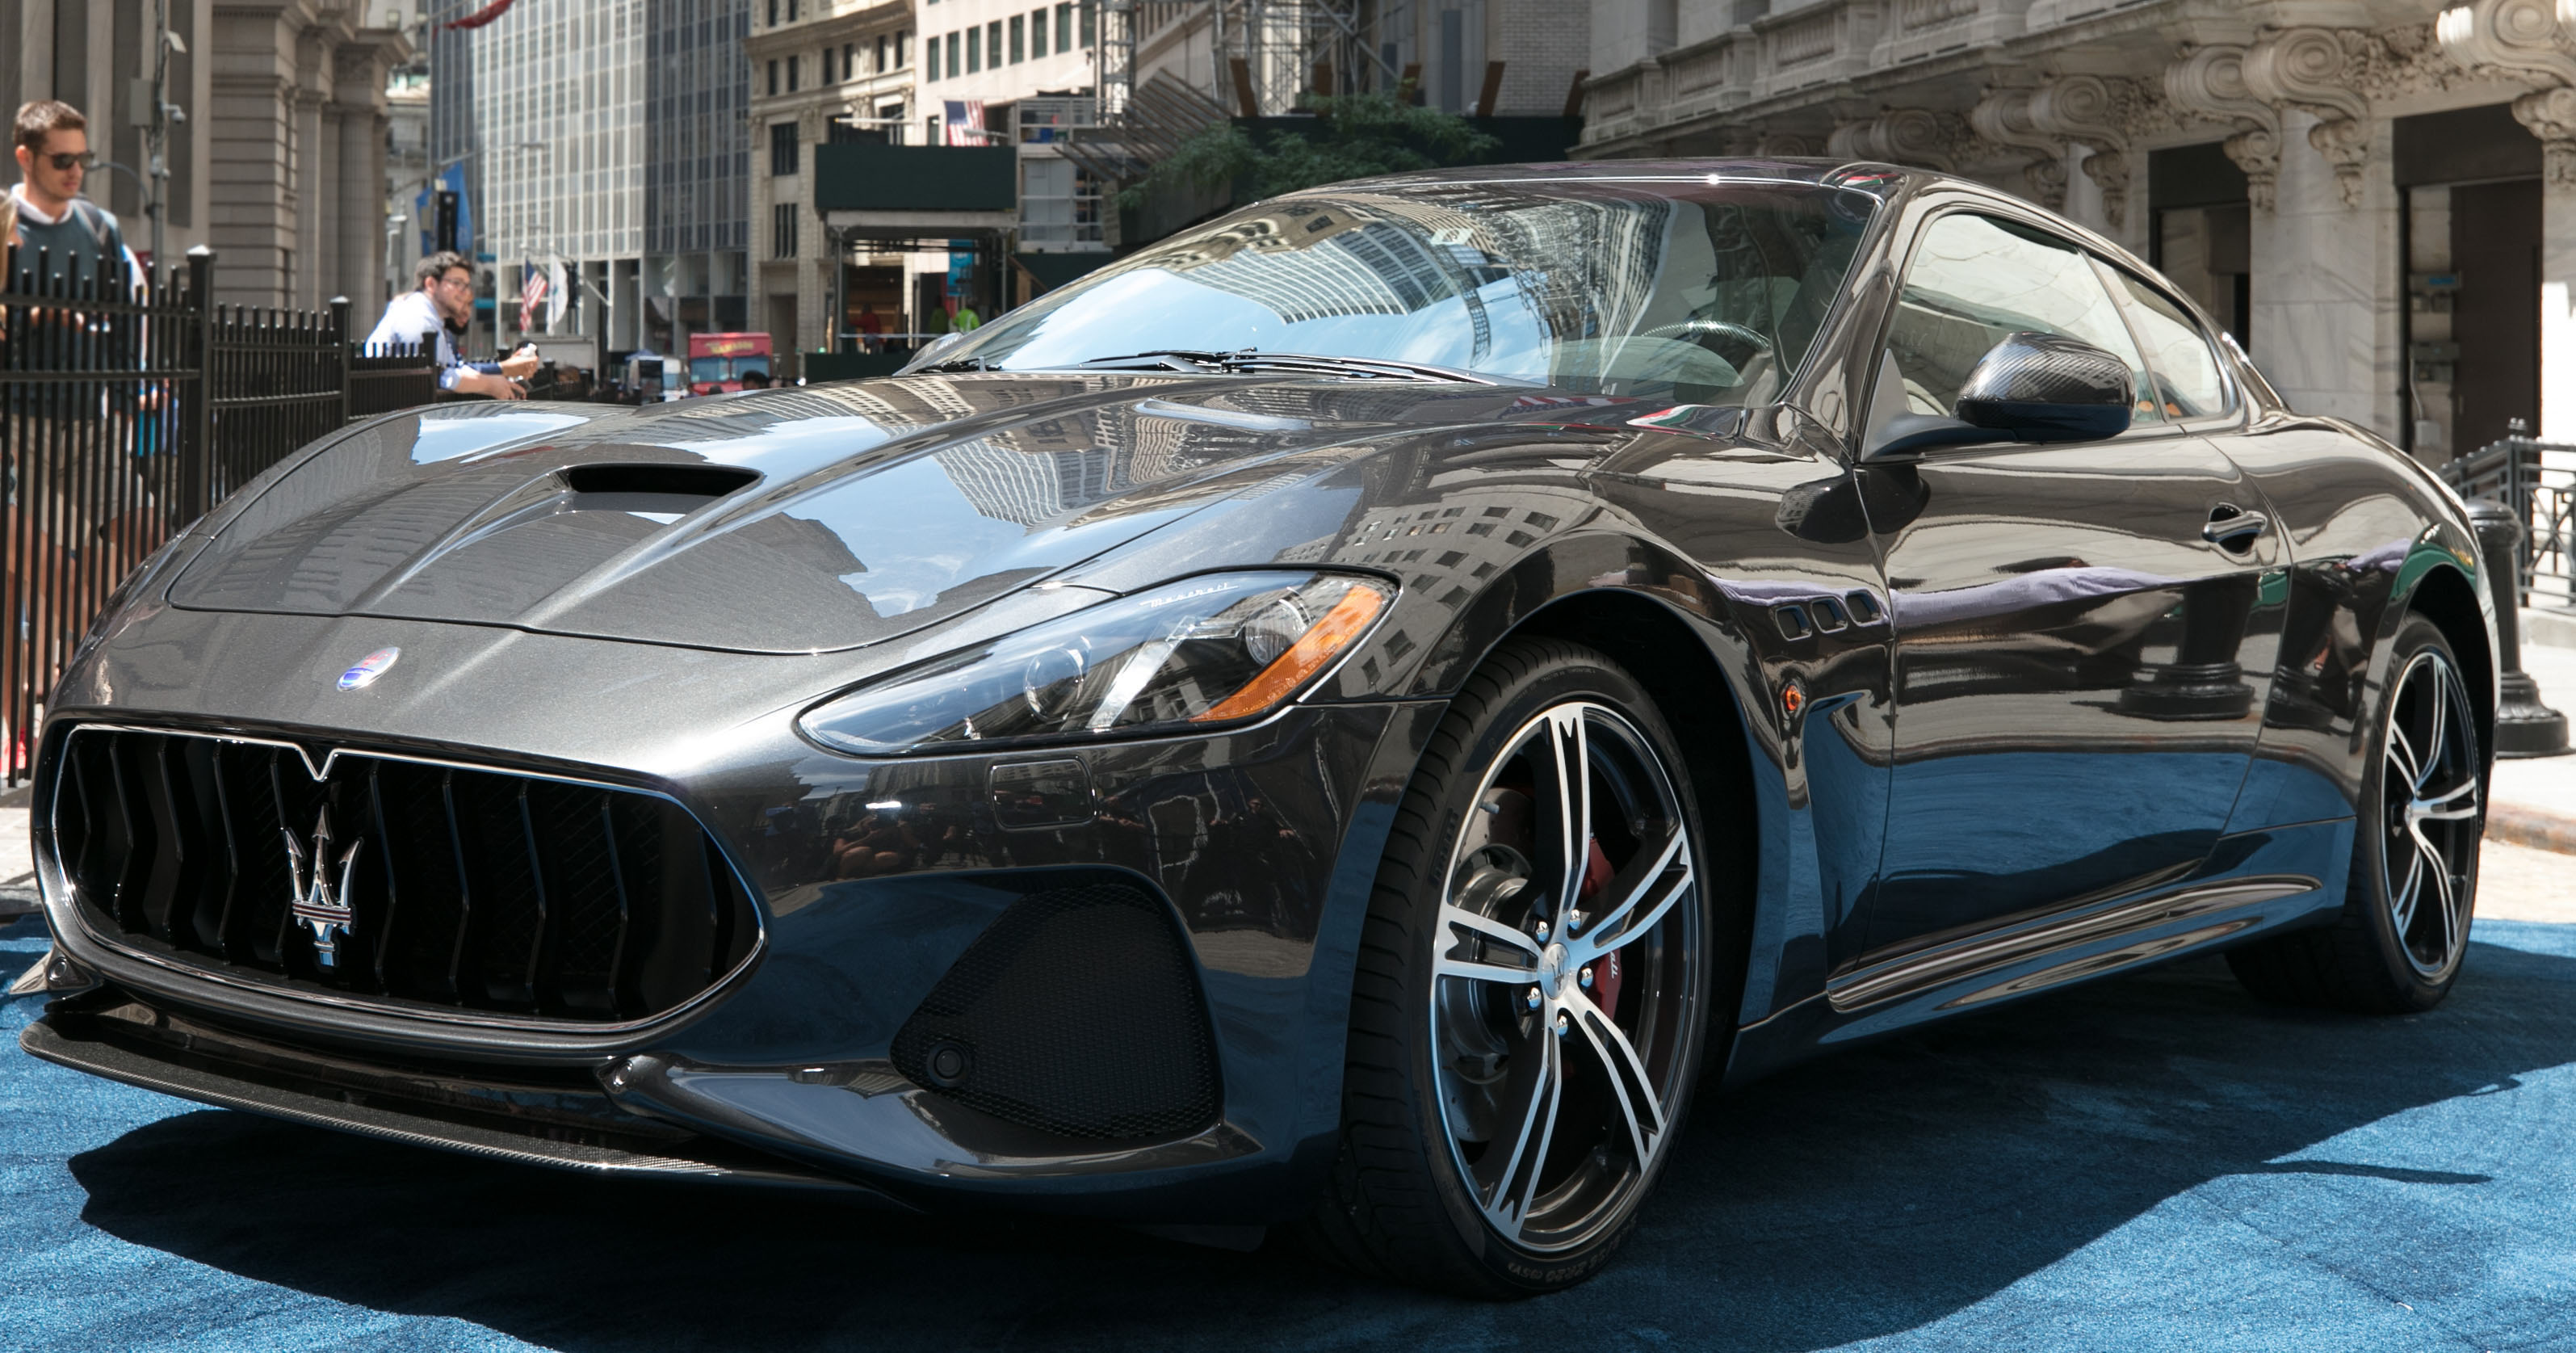 Maserati Granturismo Reviews >> 2018 Maserati GranTurismo debuts with subtle updates